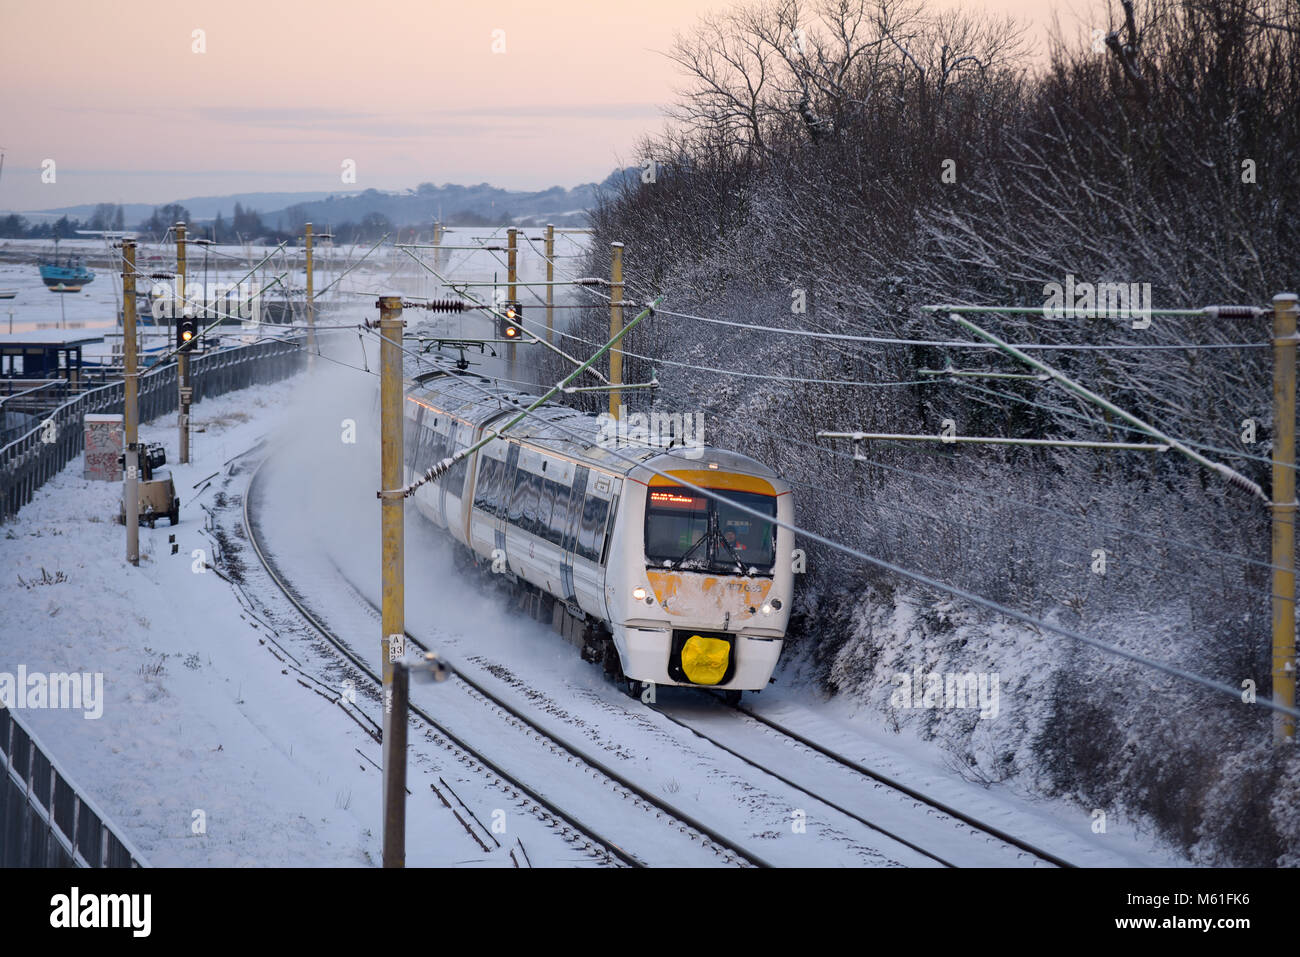 train-in-snow-c2c-railway-train-running-through-snow-covered-lines-M61FK6.jpg